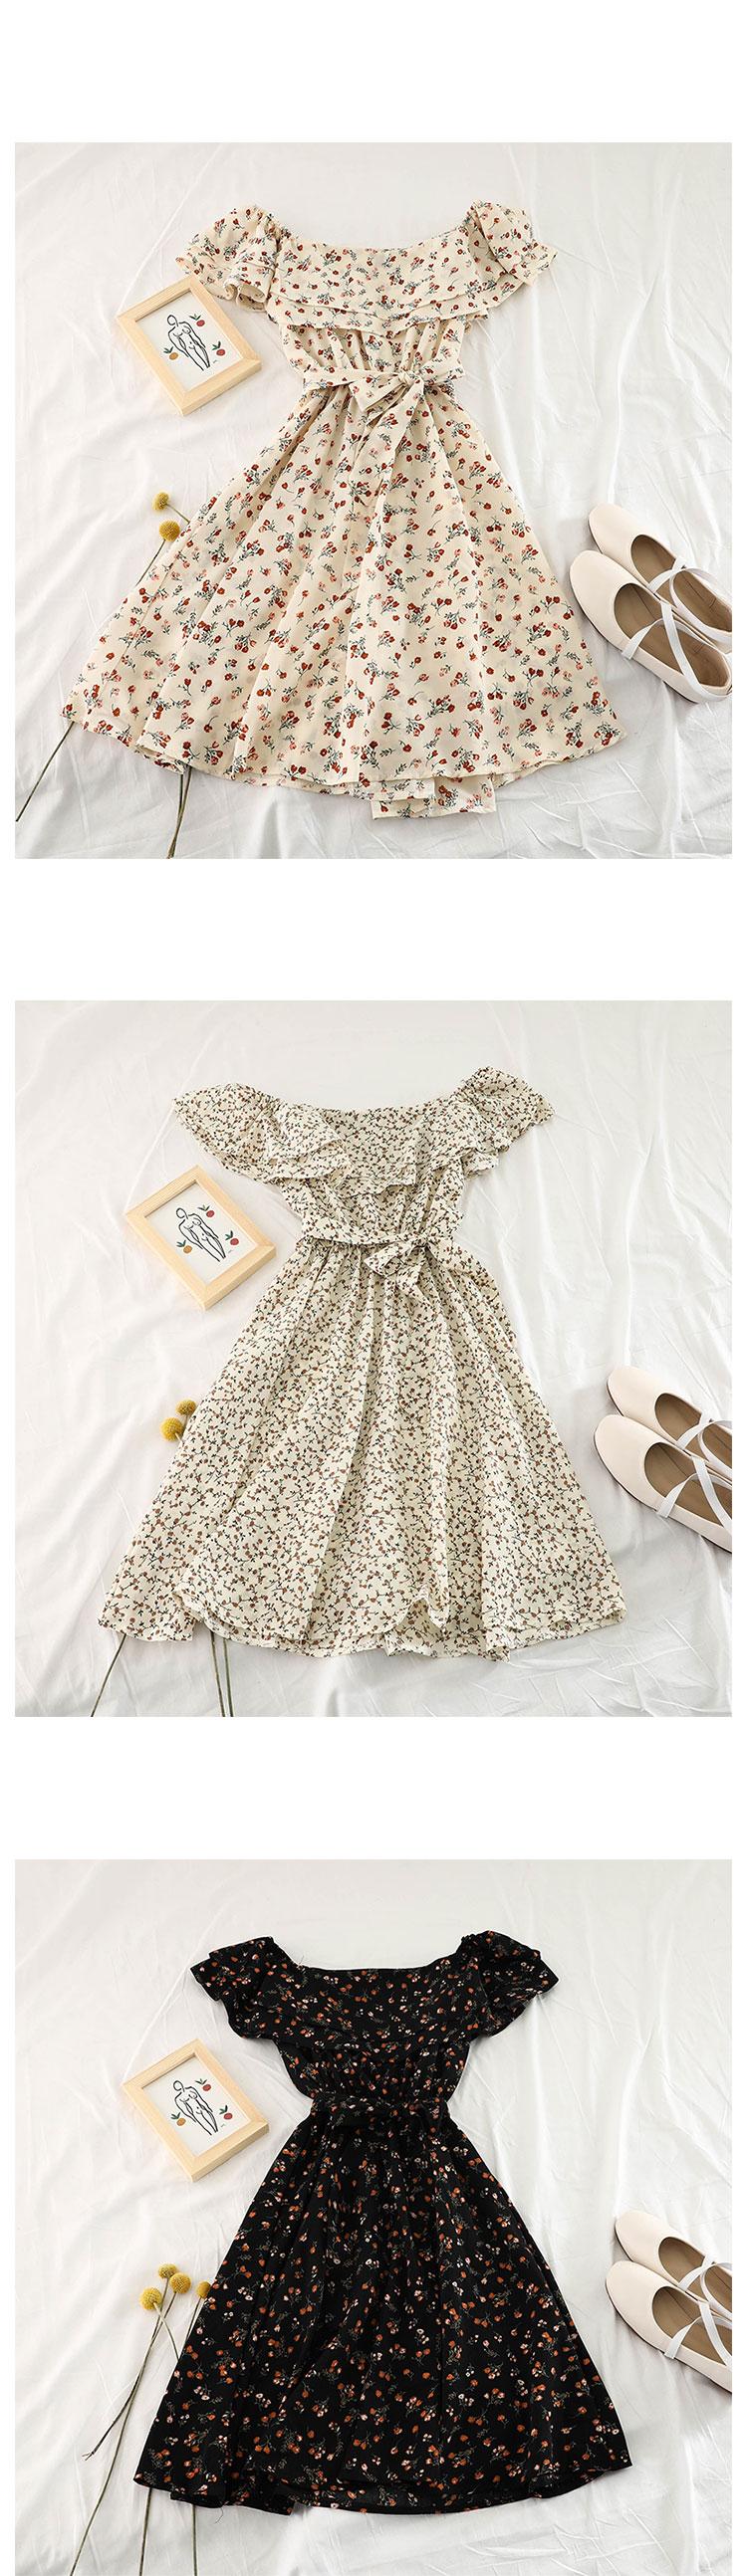 New fashion women's dresses 2